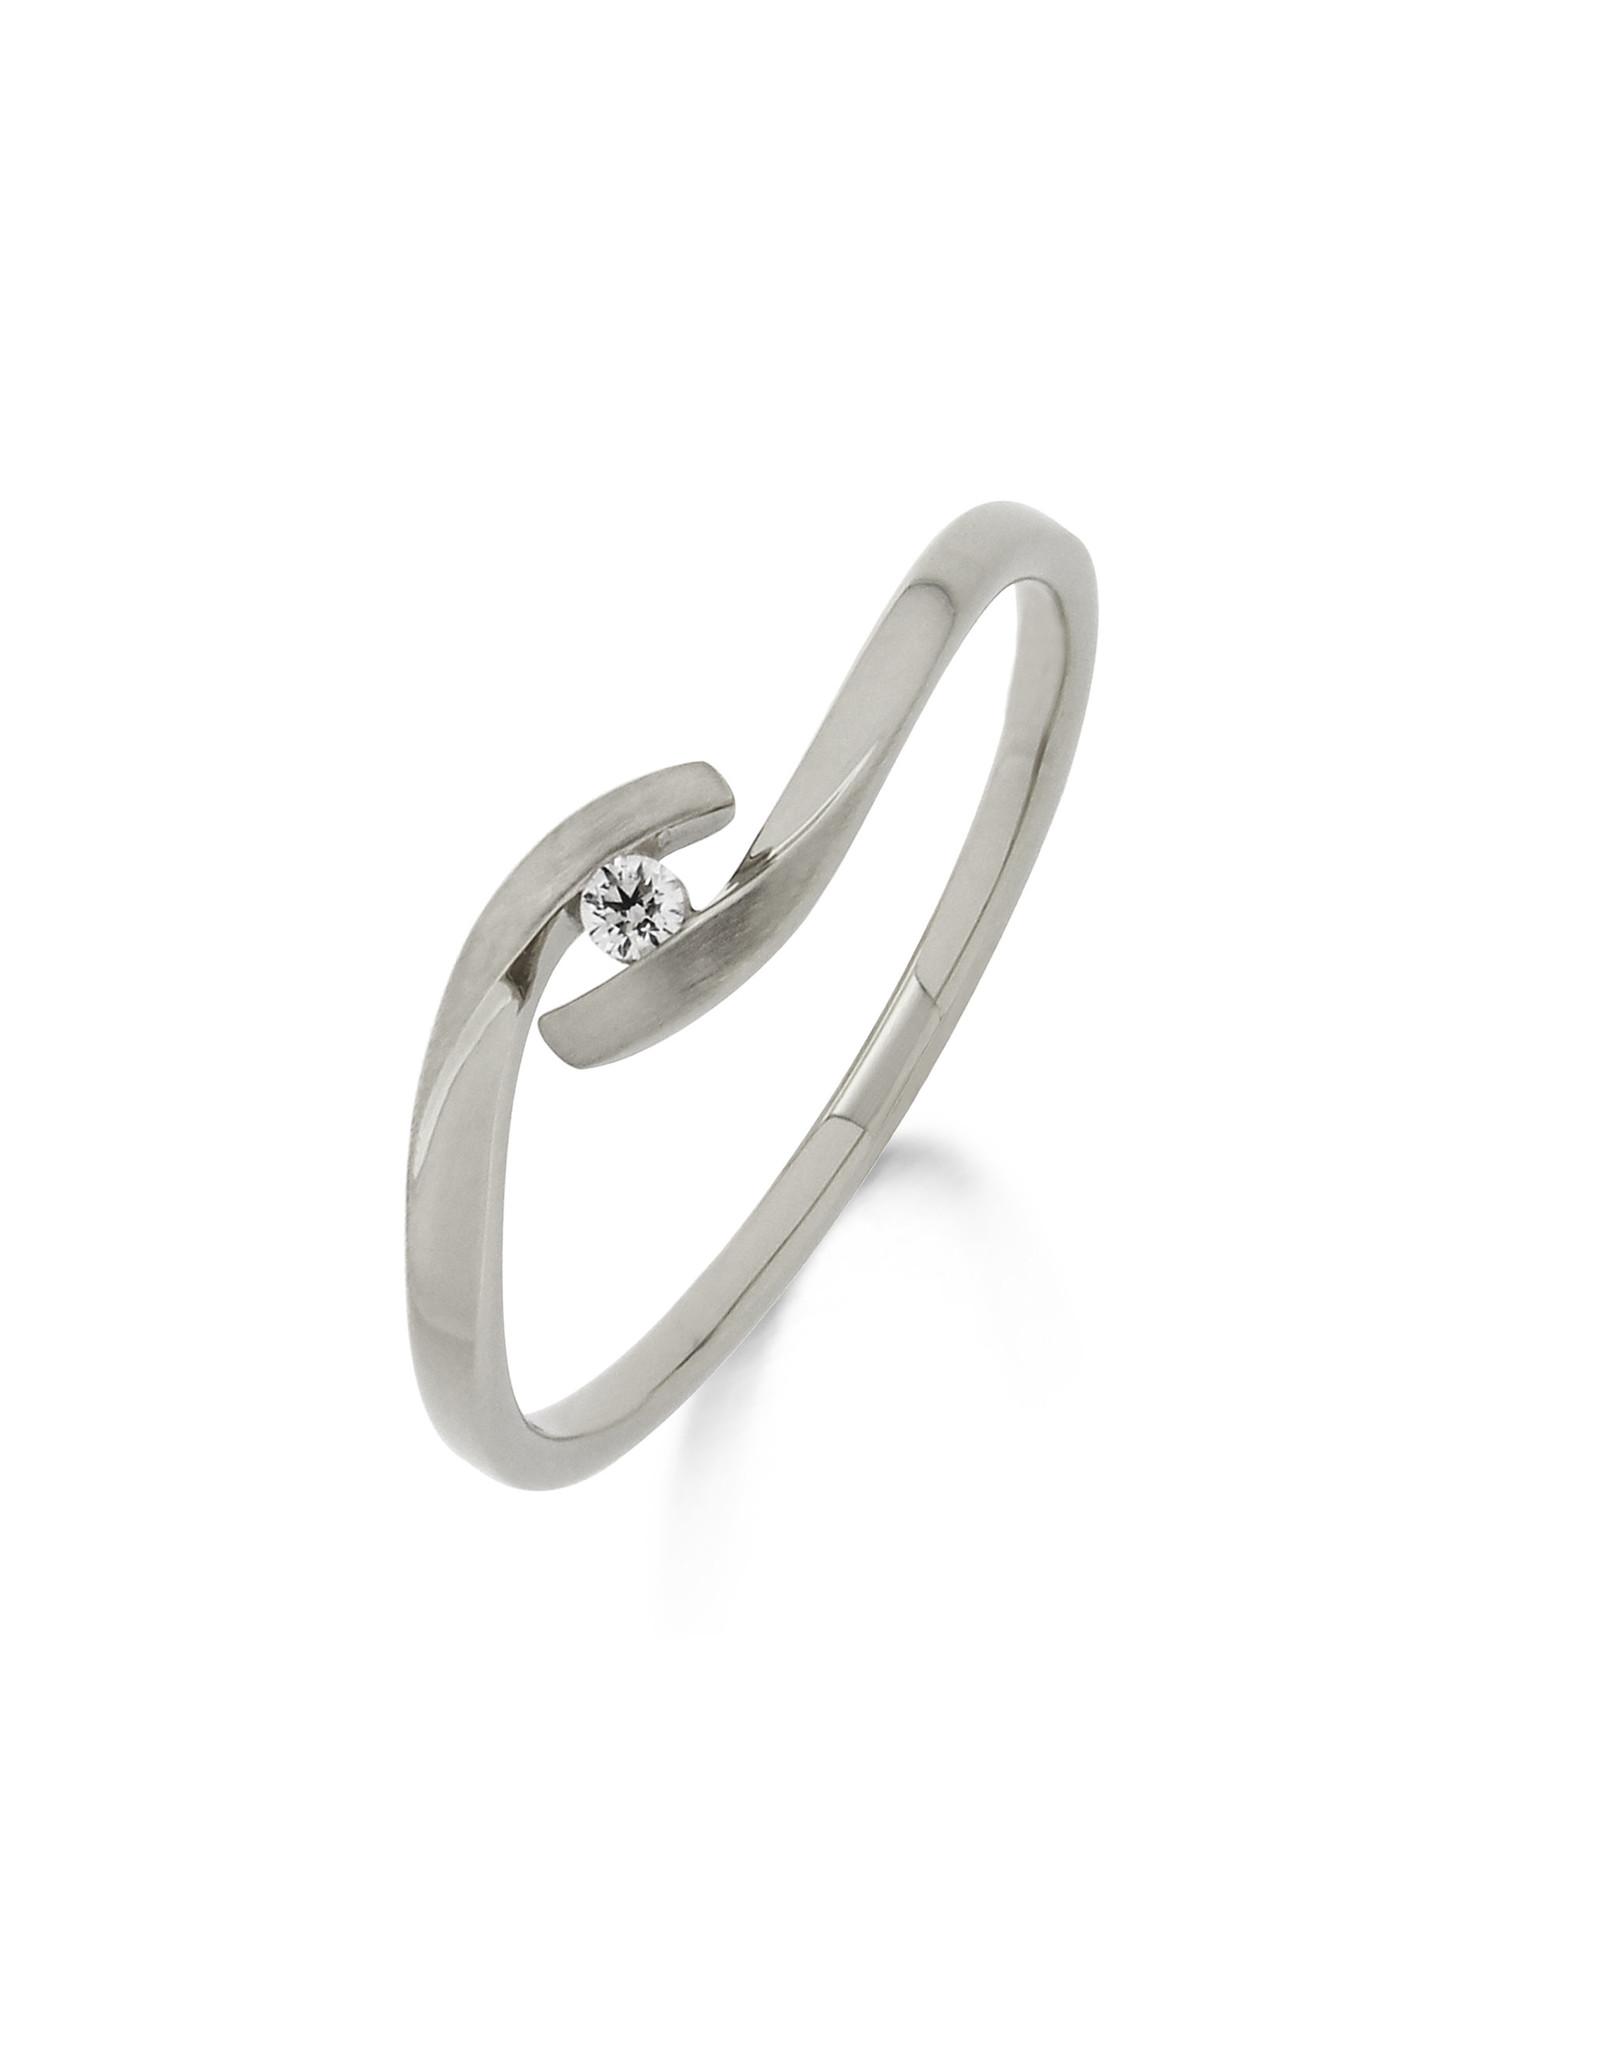 Ring Solitaire Wit Goud 18kt 91GT20/A-54 briljant 0.030 ct